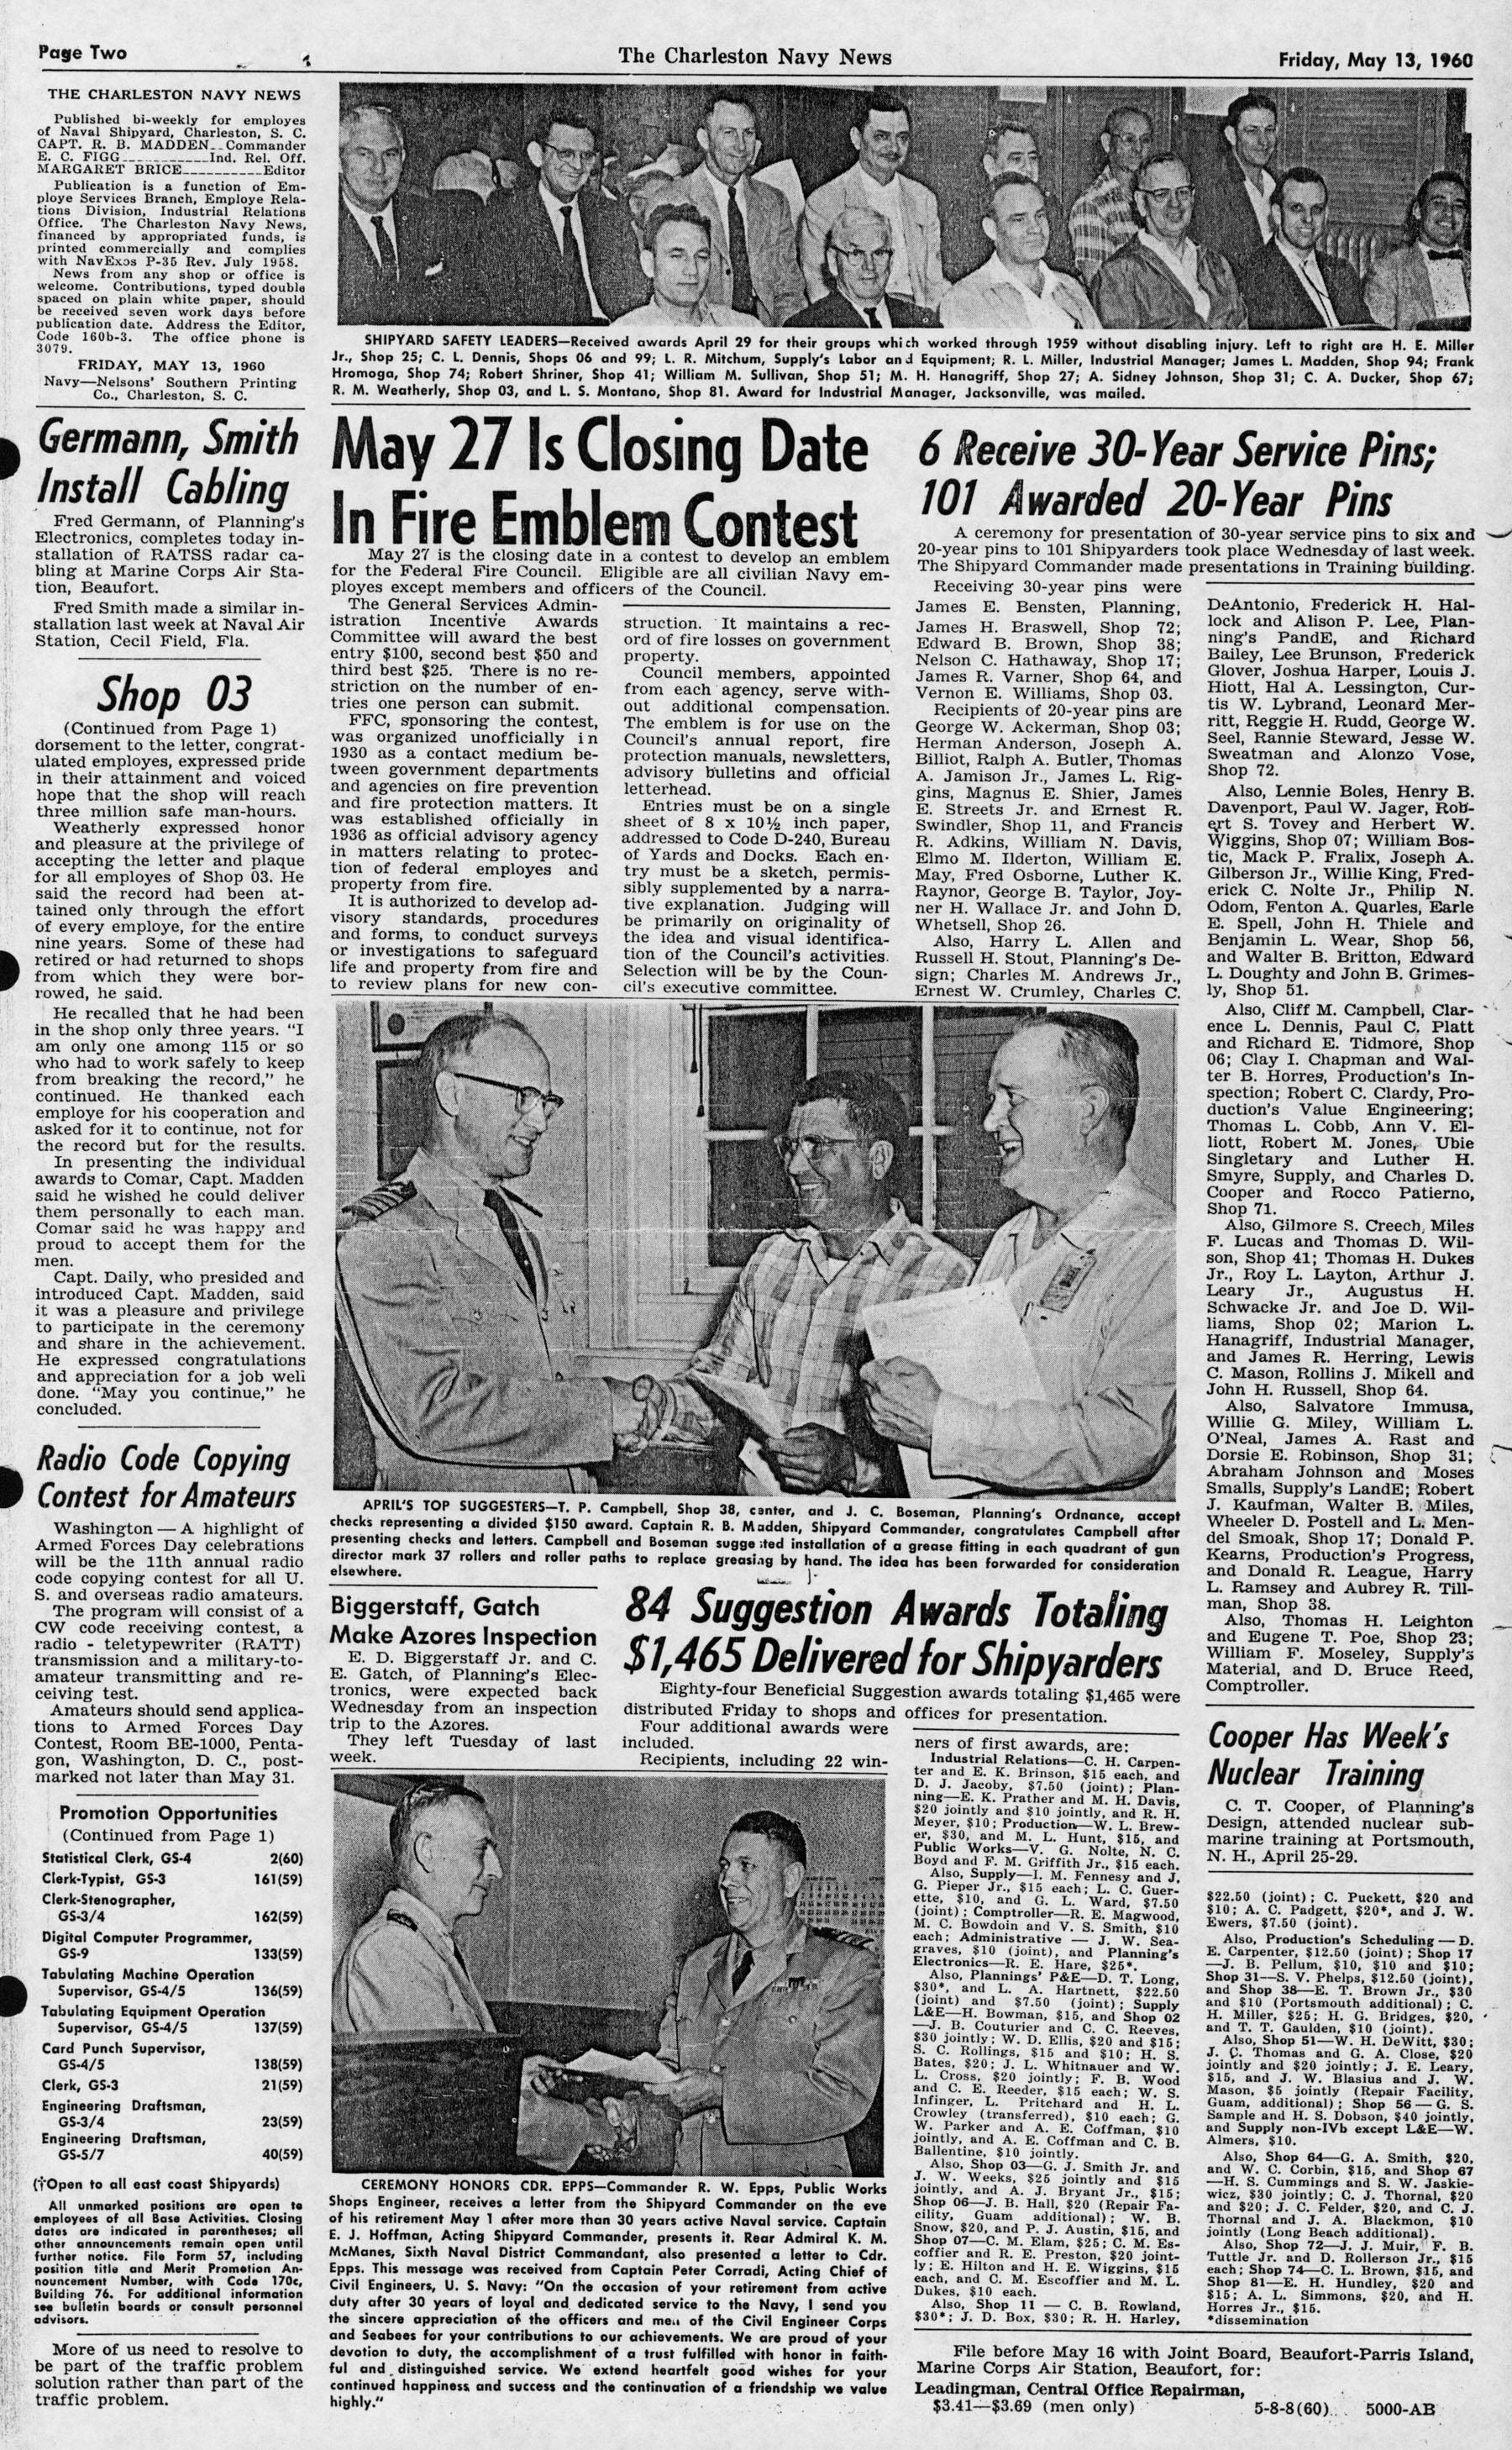 The Charleston Navy News, Volume 18, Edition 22, page ii